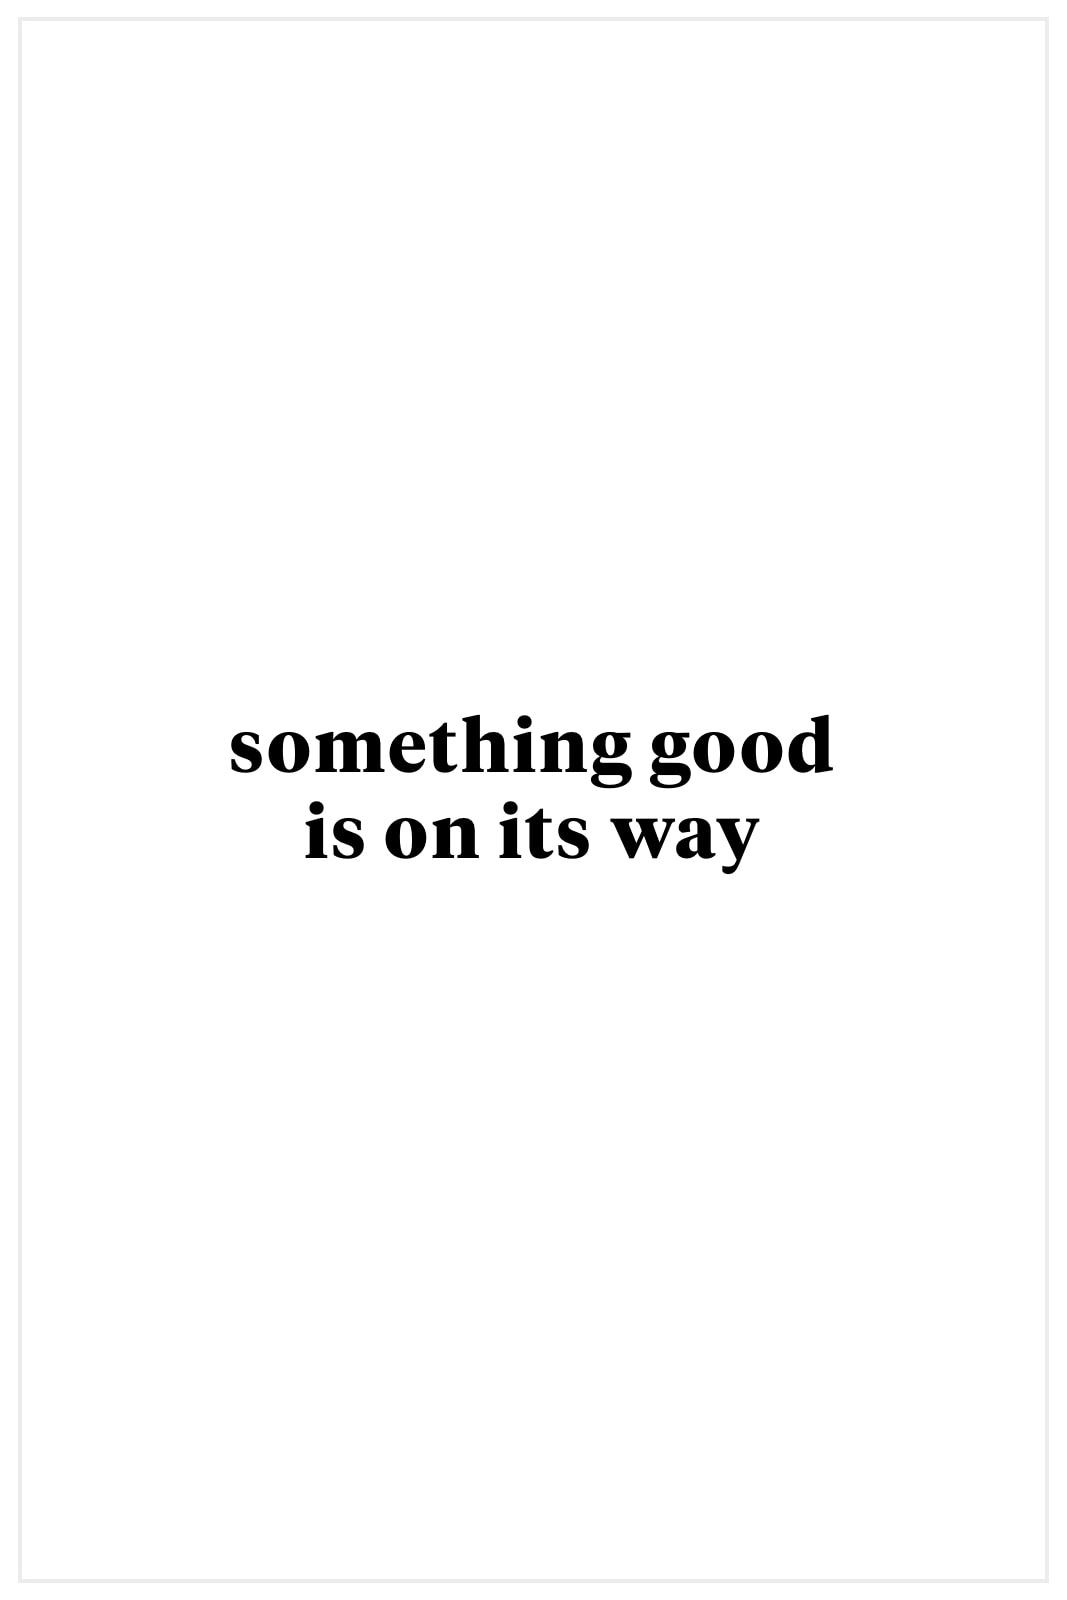 1804b4d6b8d83 Shop Women's Tops, T-Shirts, Camis & More at EVEREVE